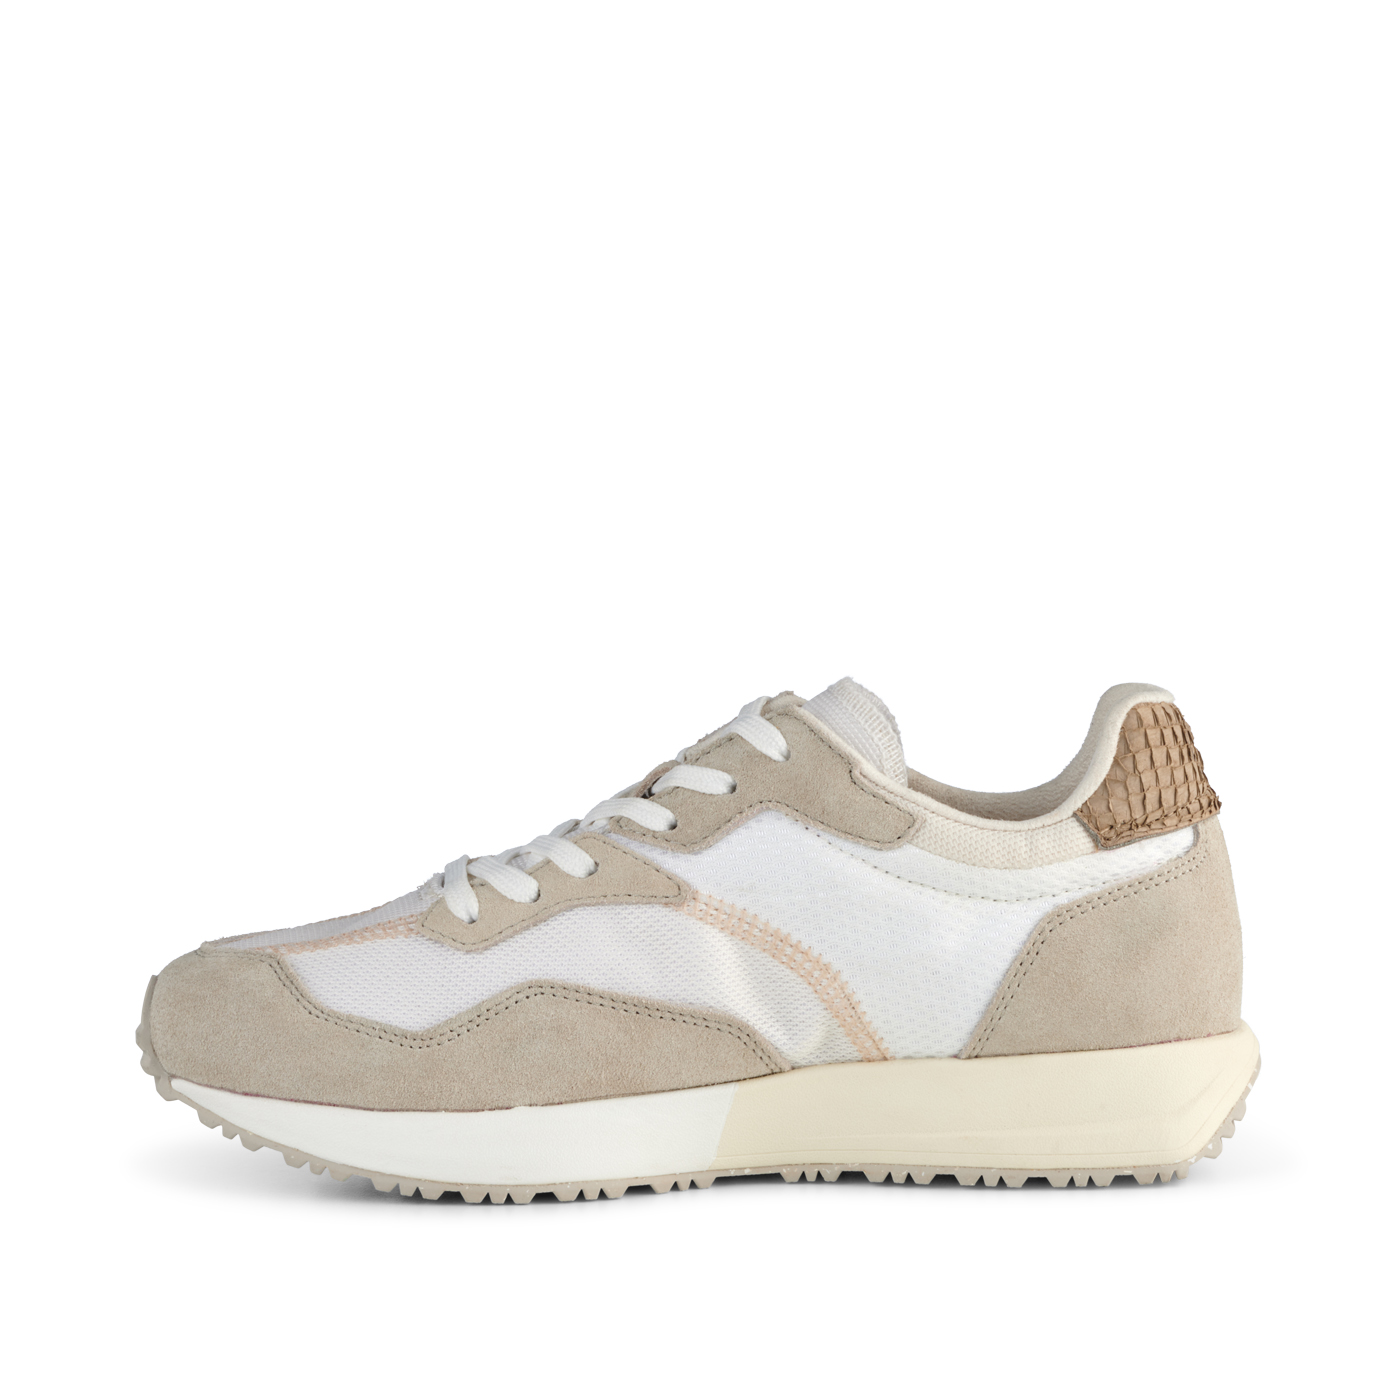 Woden WL882 sneakers 36 774,Hvid, 36